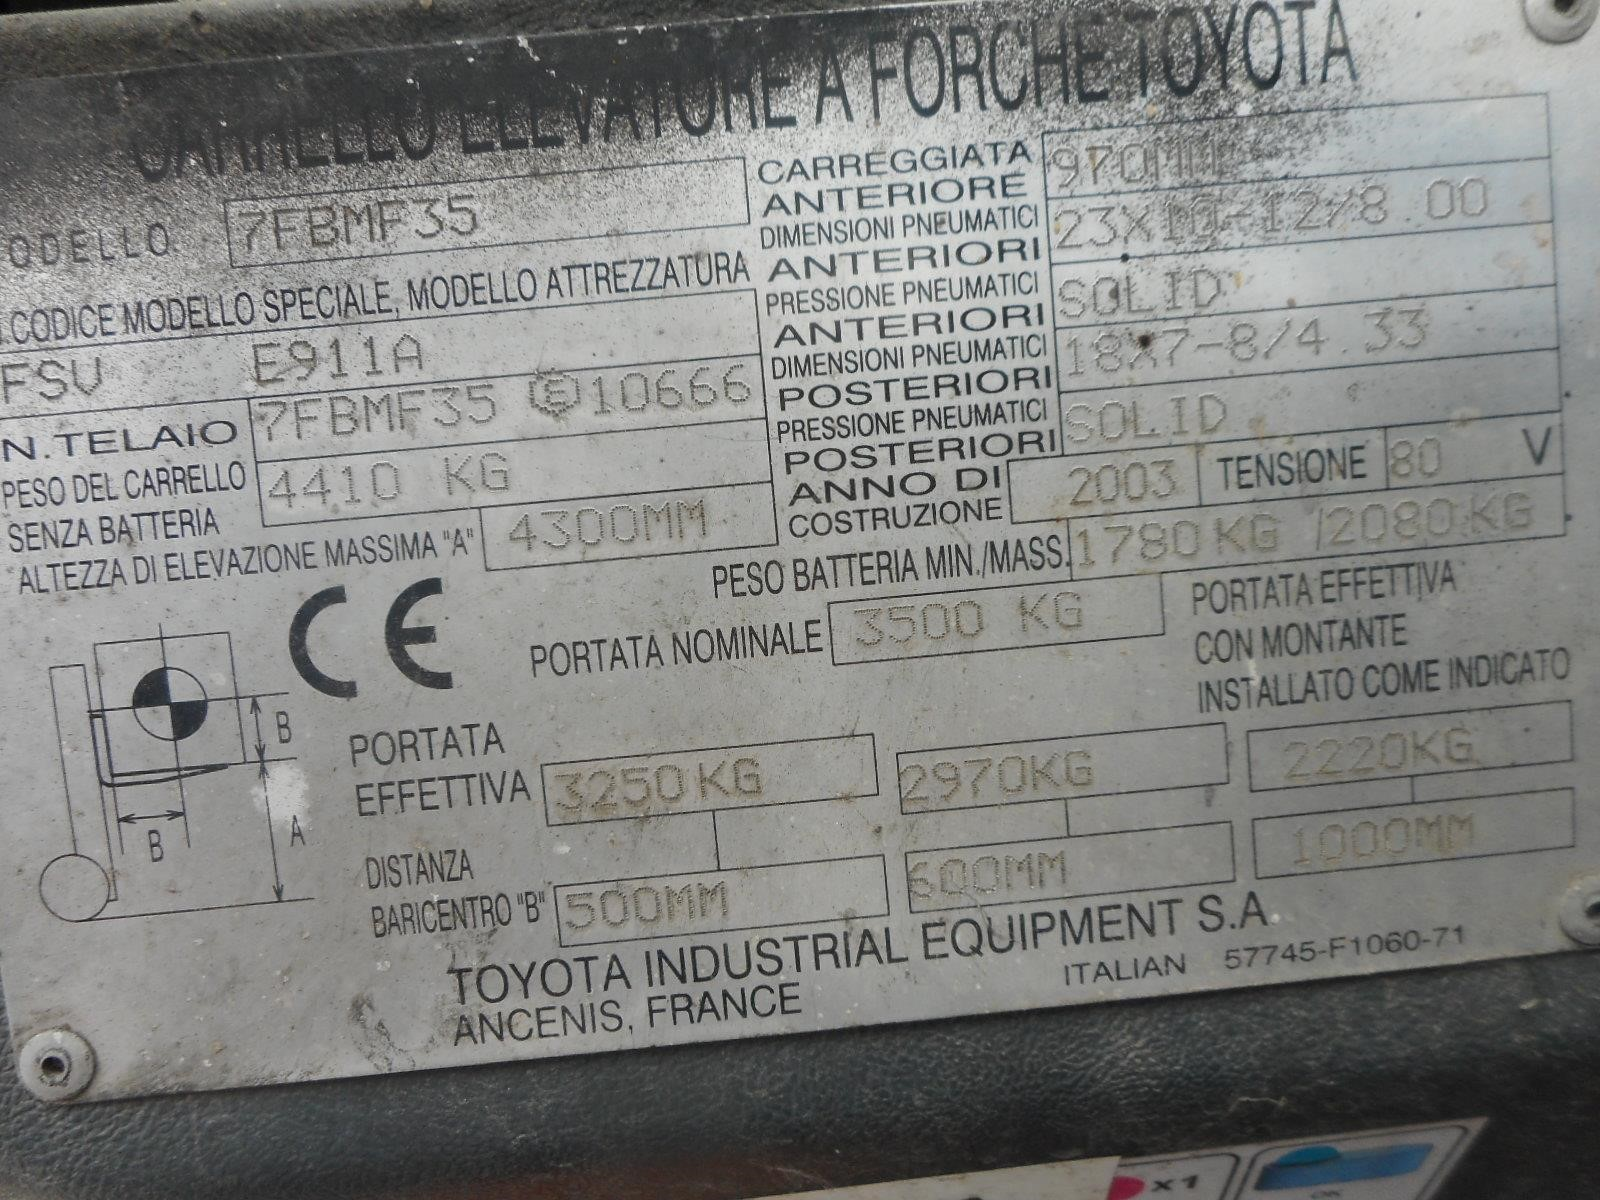 Toyota 7FBMF35 Usato